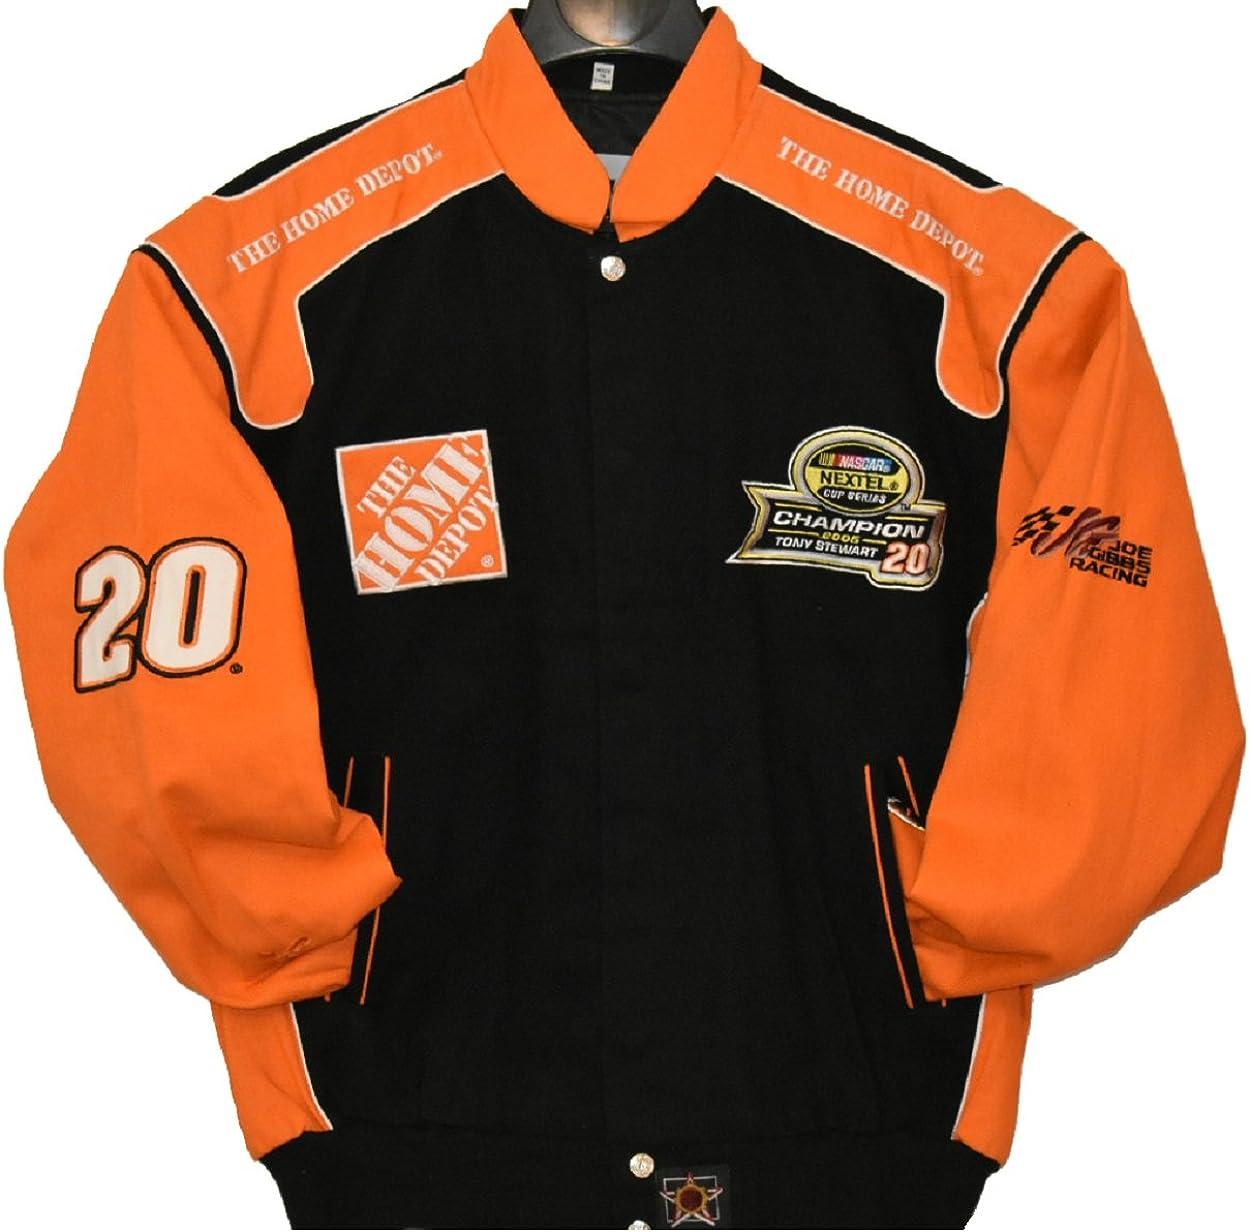 Tony Stewart Nextel Cup Series Championship Jacket Size Large Black